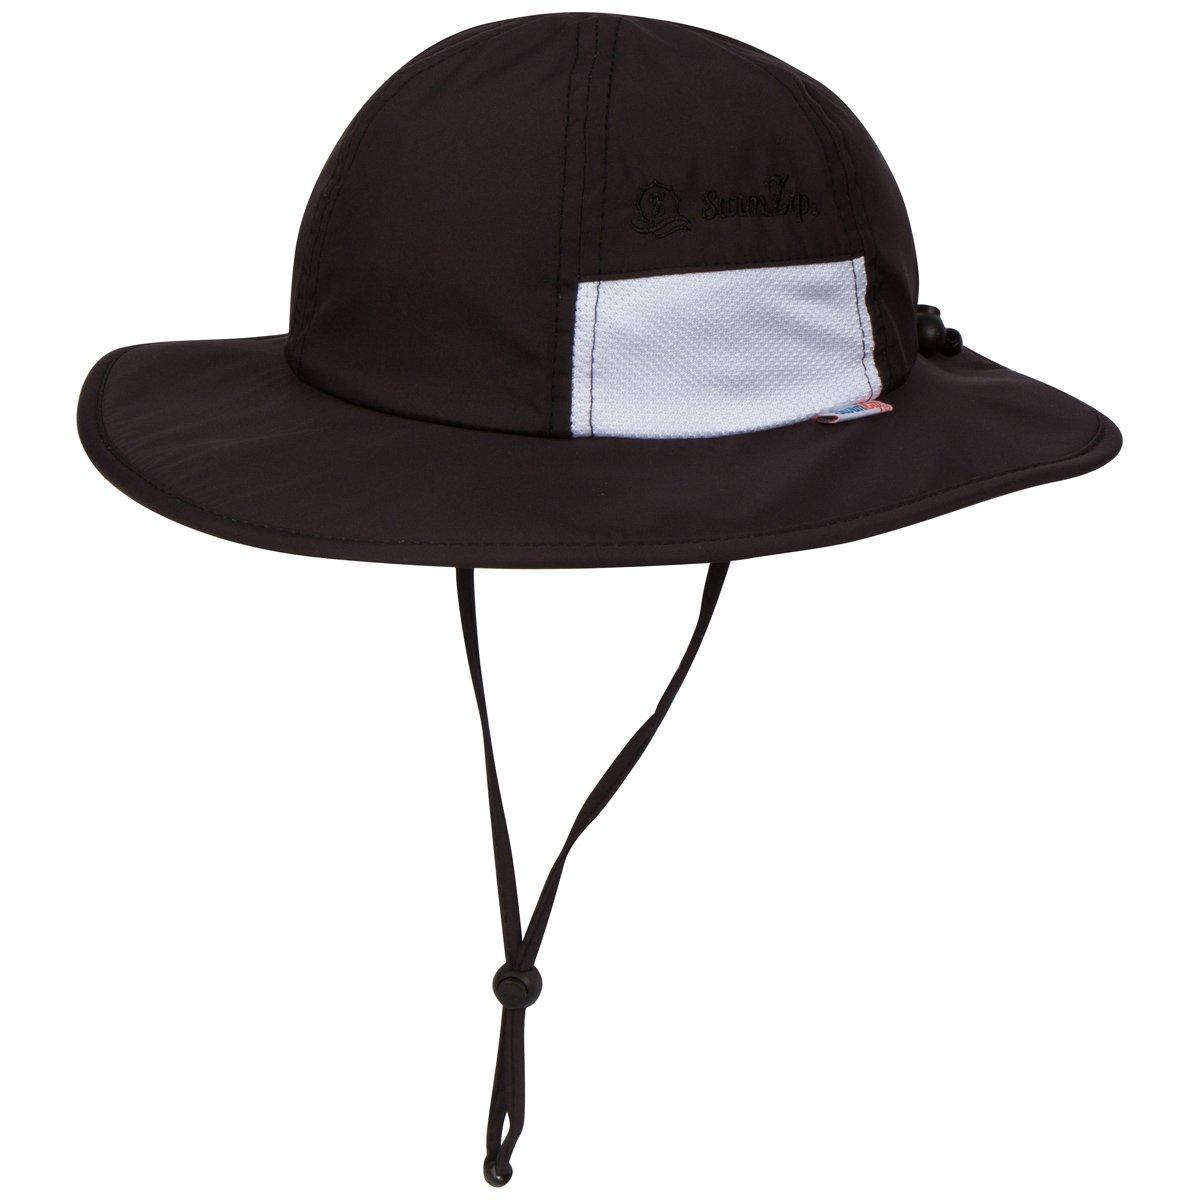 SwimZip Unisex Child Wide Brim Sun Protection Hat UPF 50 Adjustable ,Black,6-24 Mont